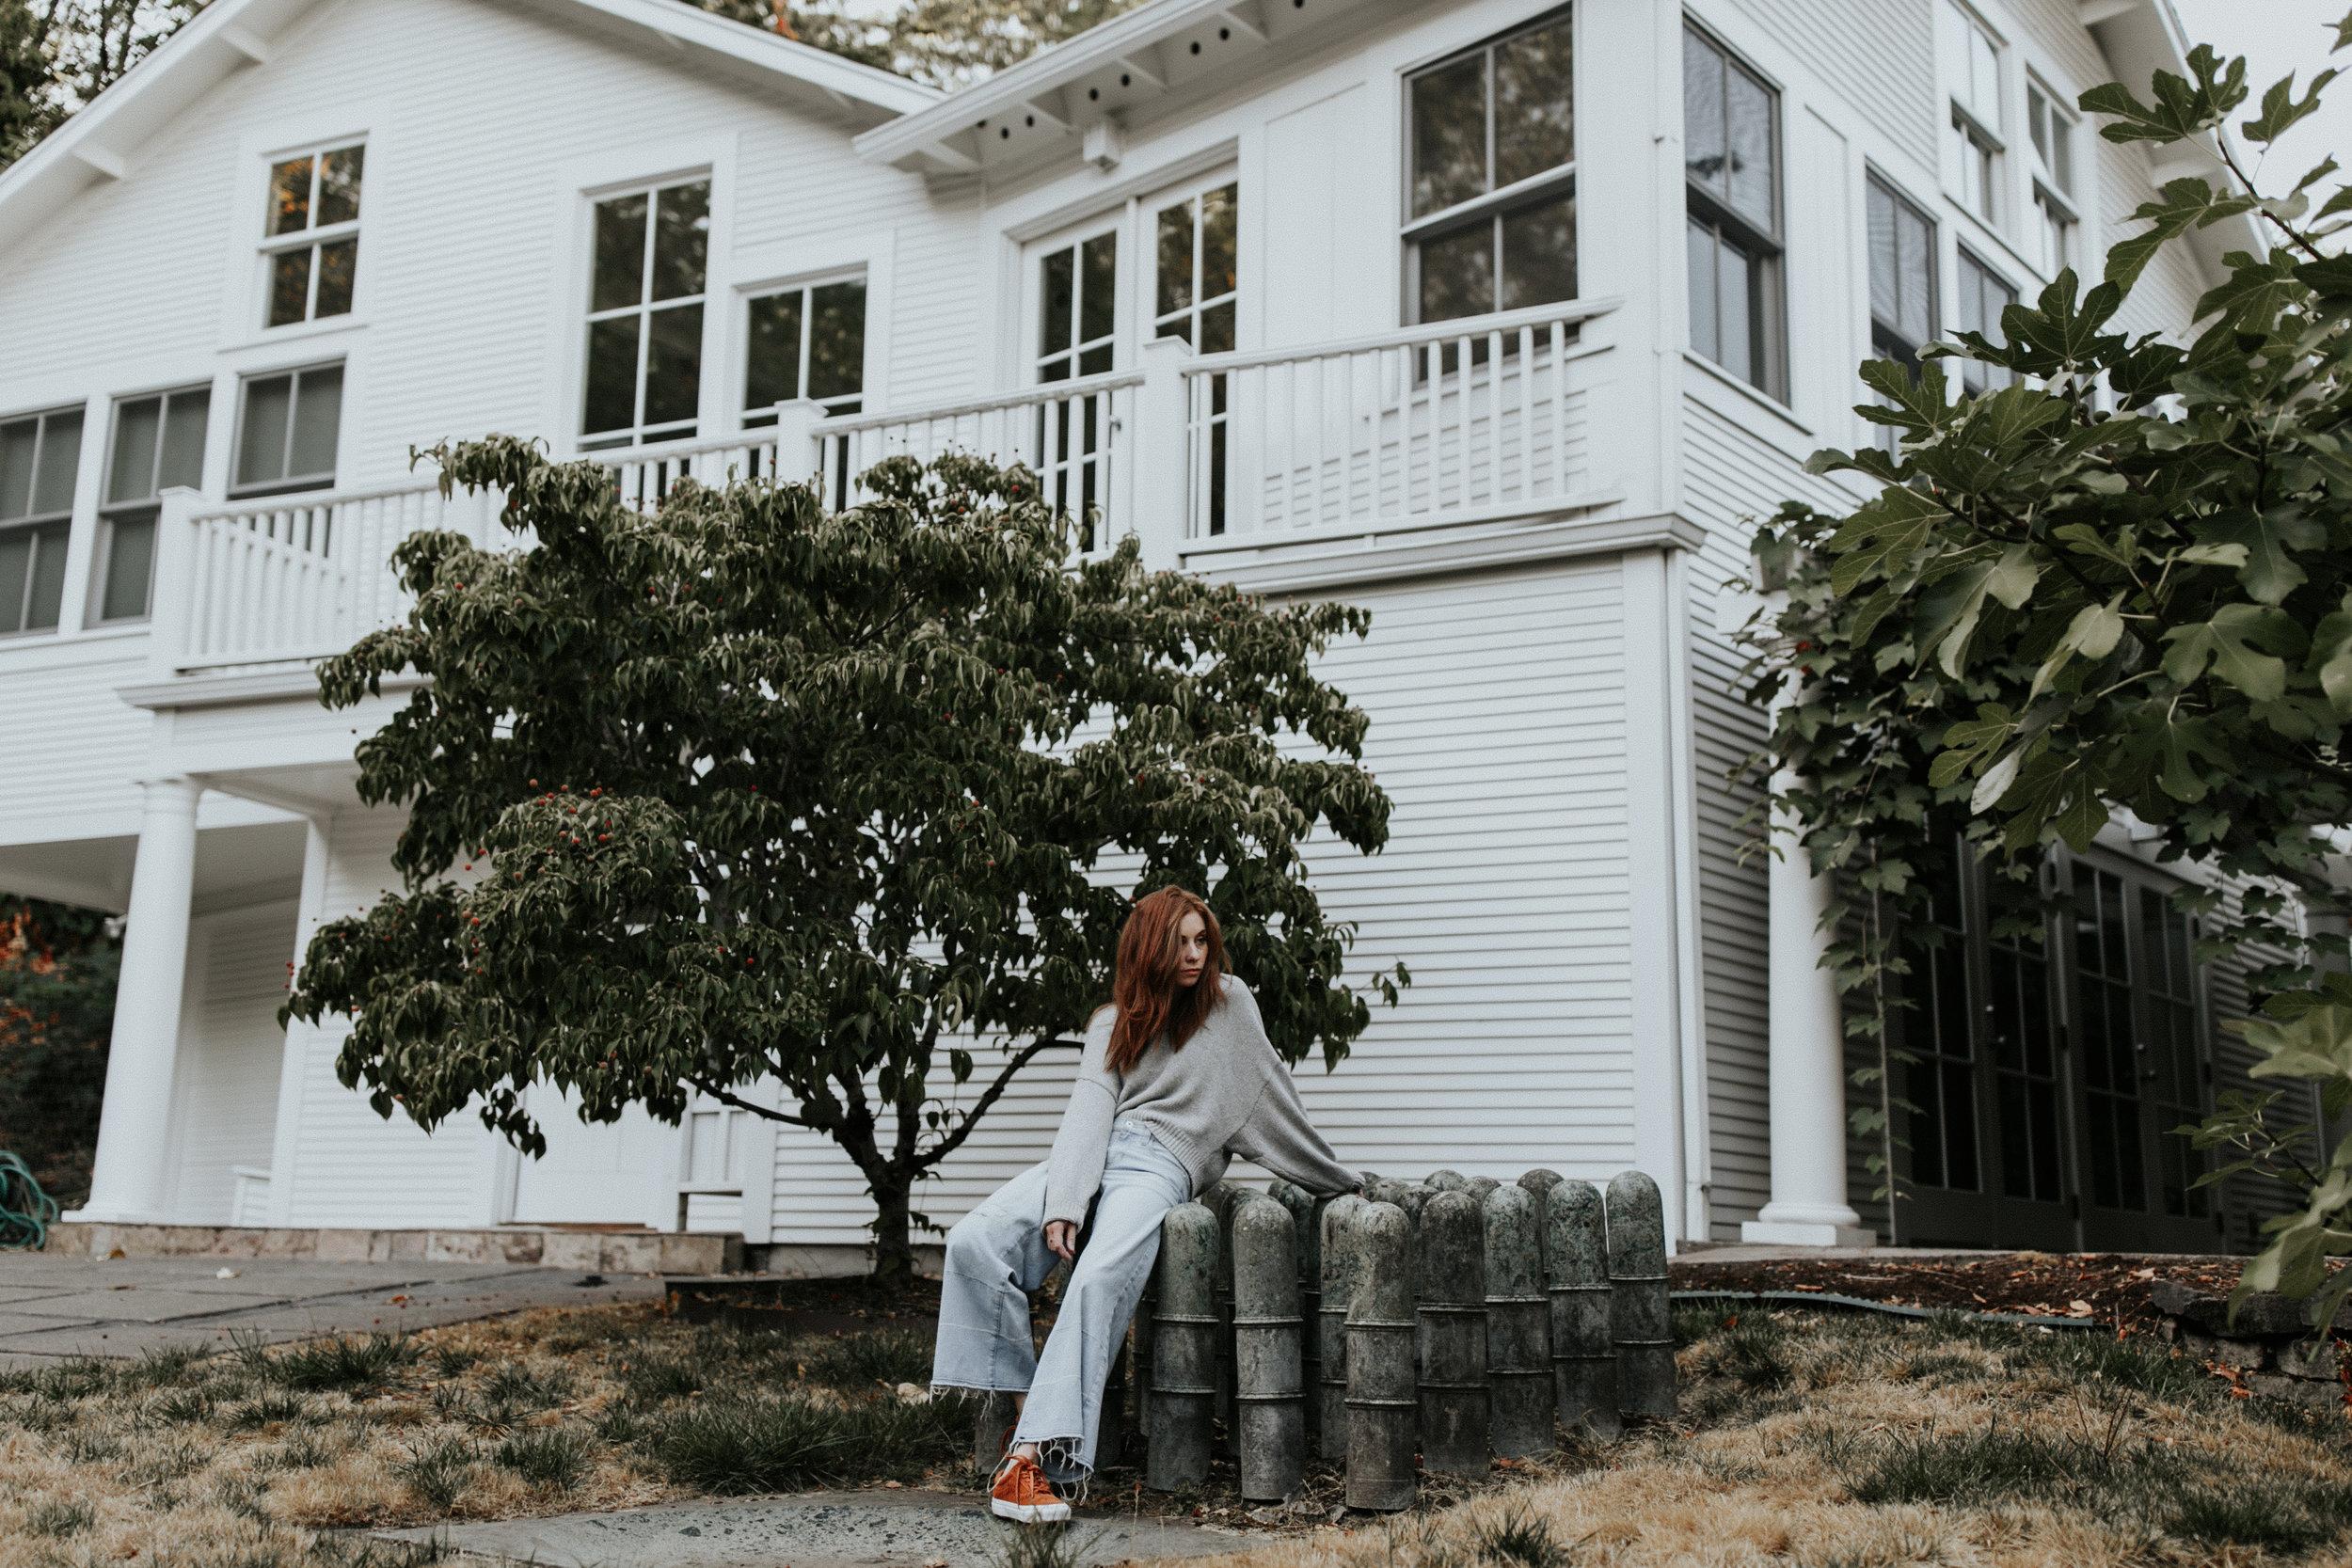 9.12.17_Liz Ballmaier_Portland Oregon_Madeline Mae Photography-36.jpg